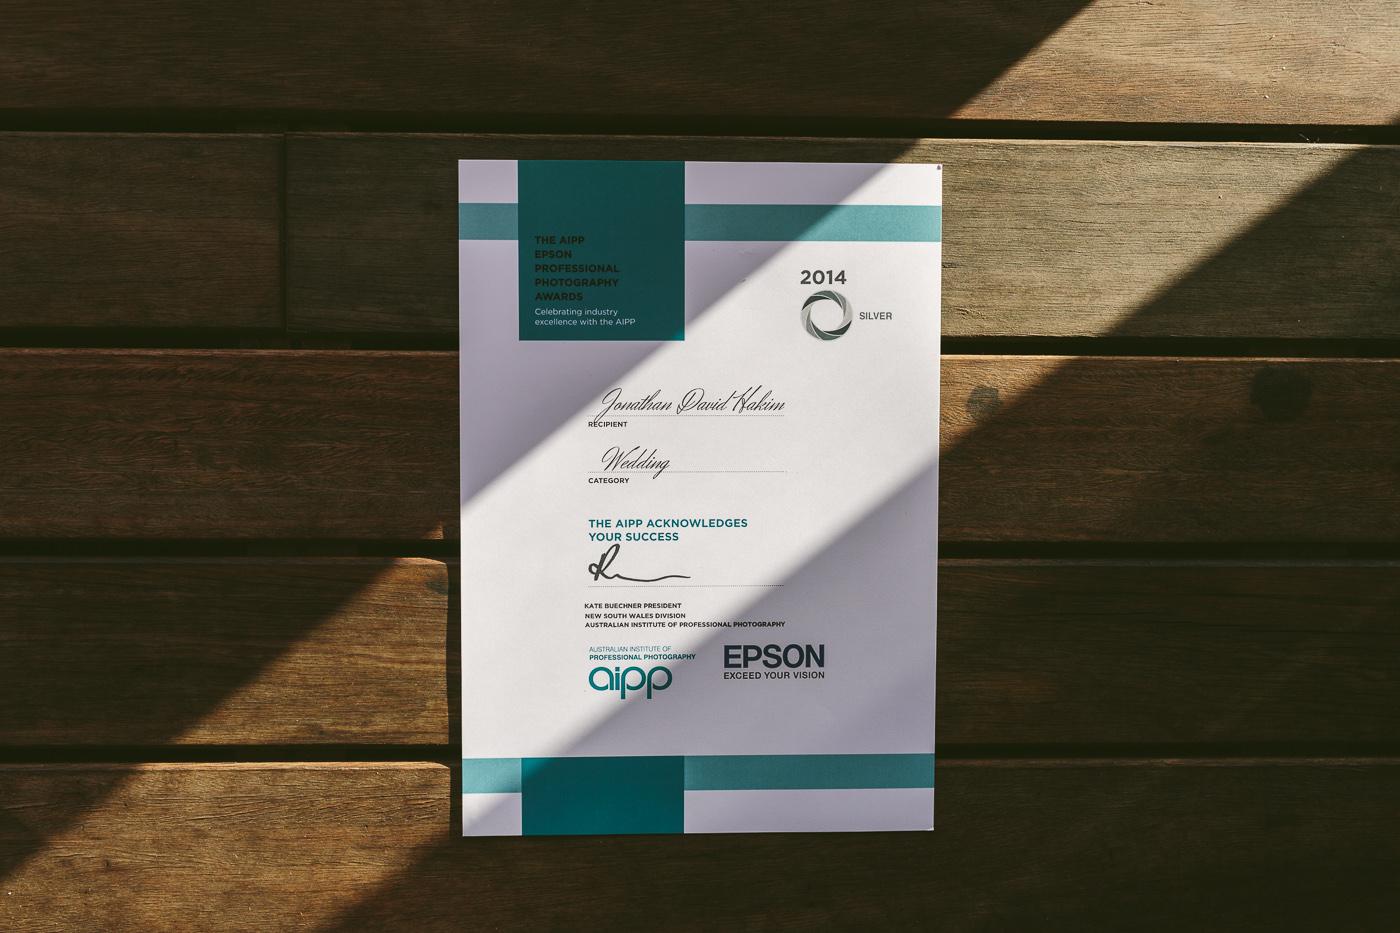 aipp-appa-photography-award-silver-award